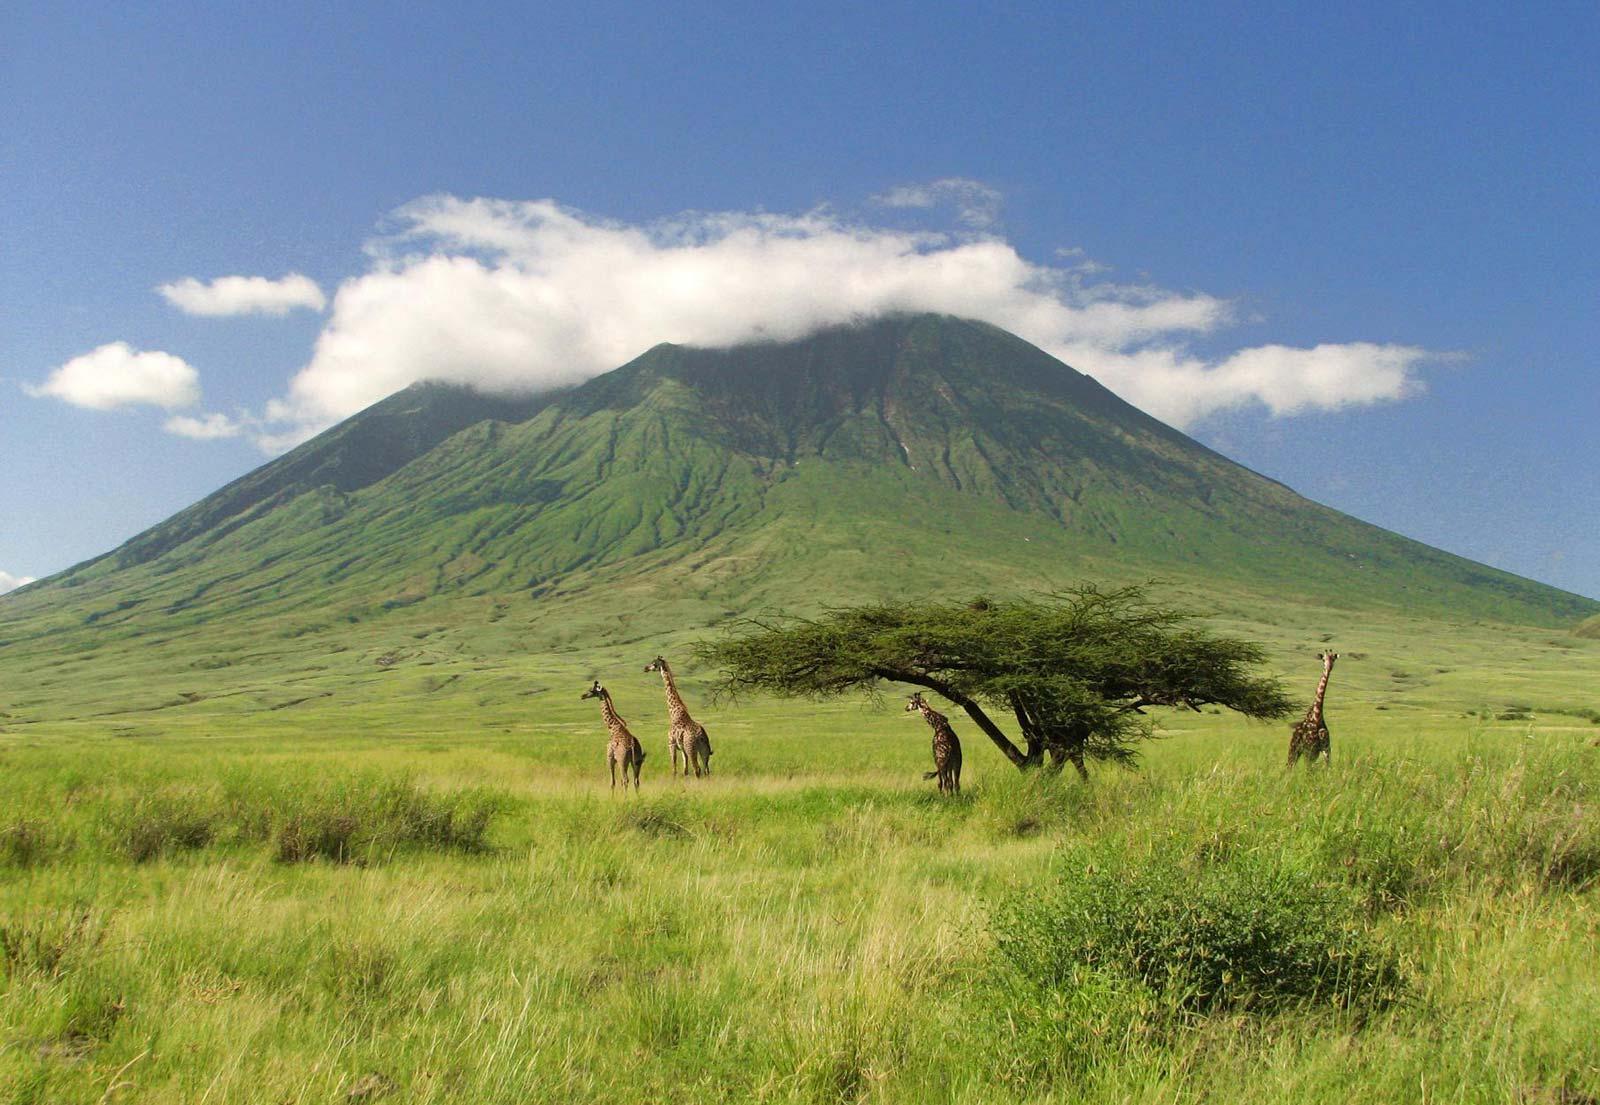 килиманджаро фото горы